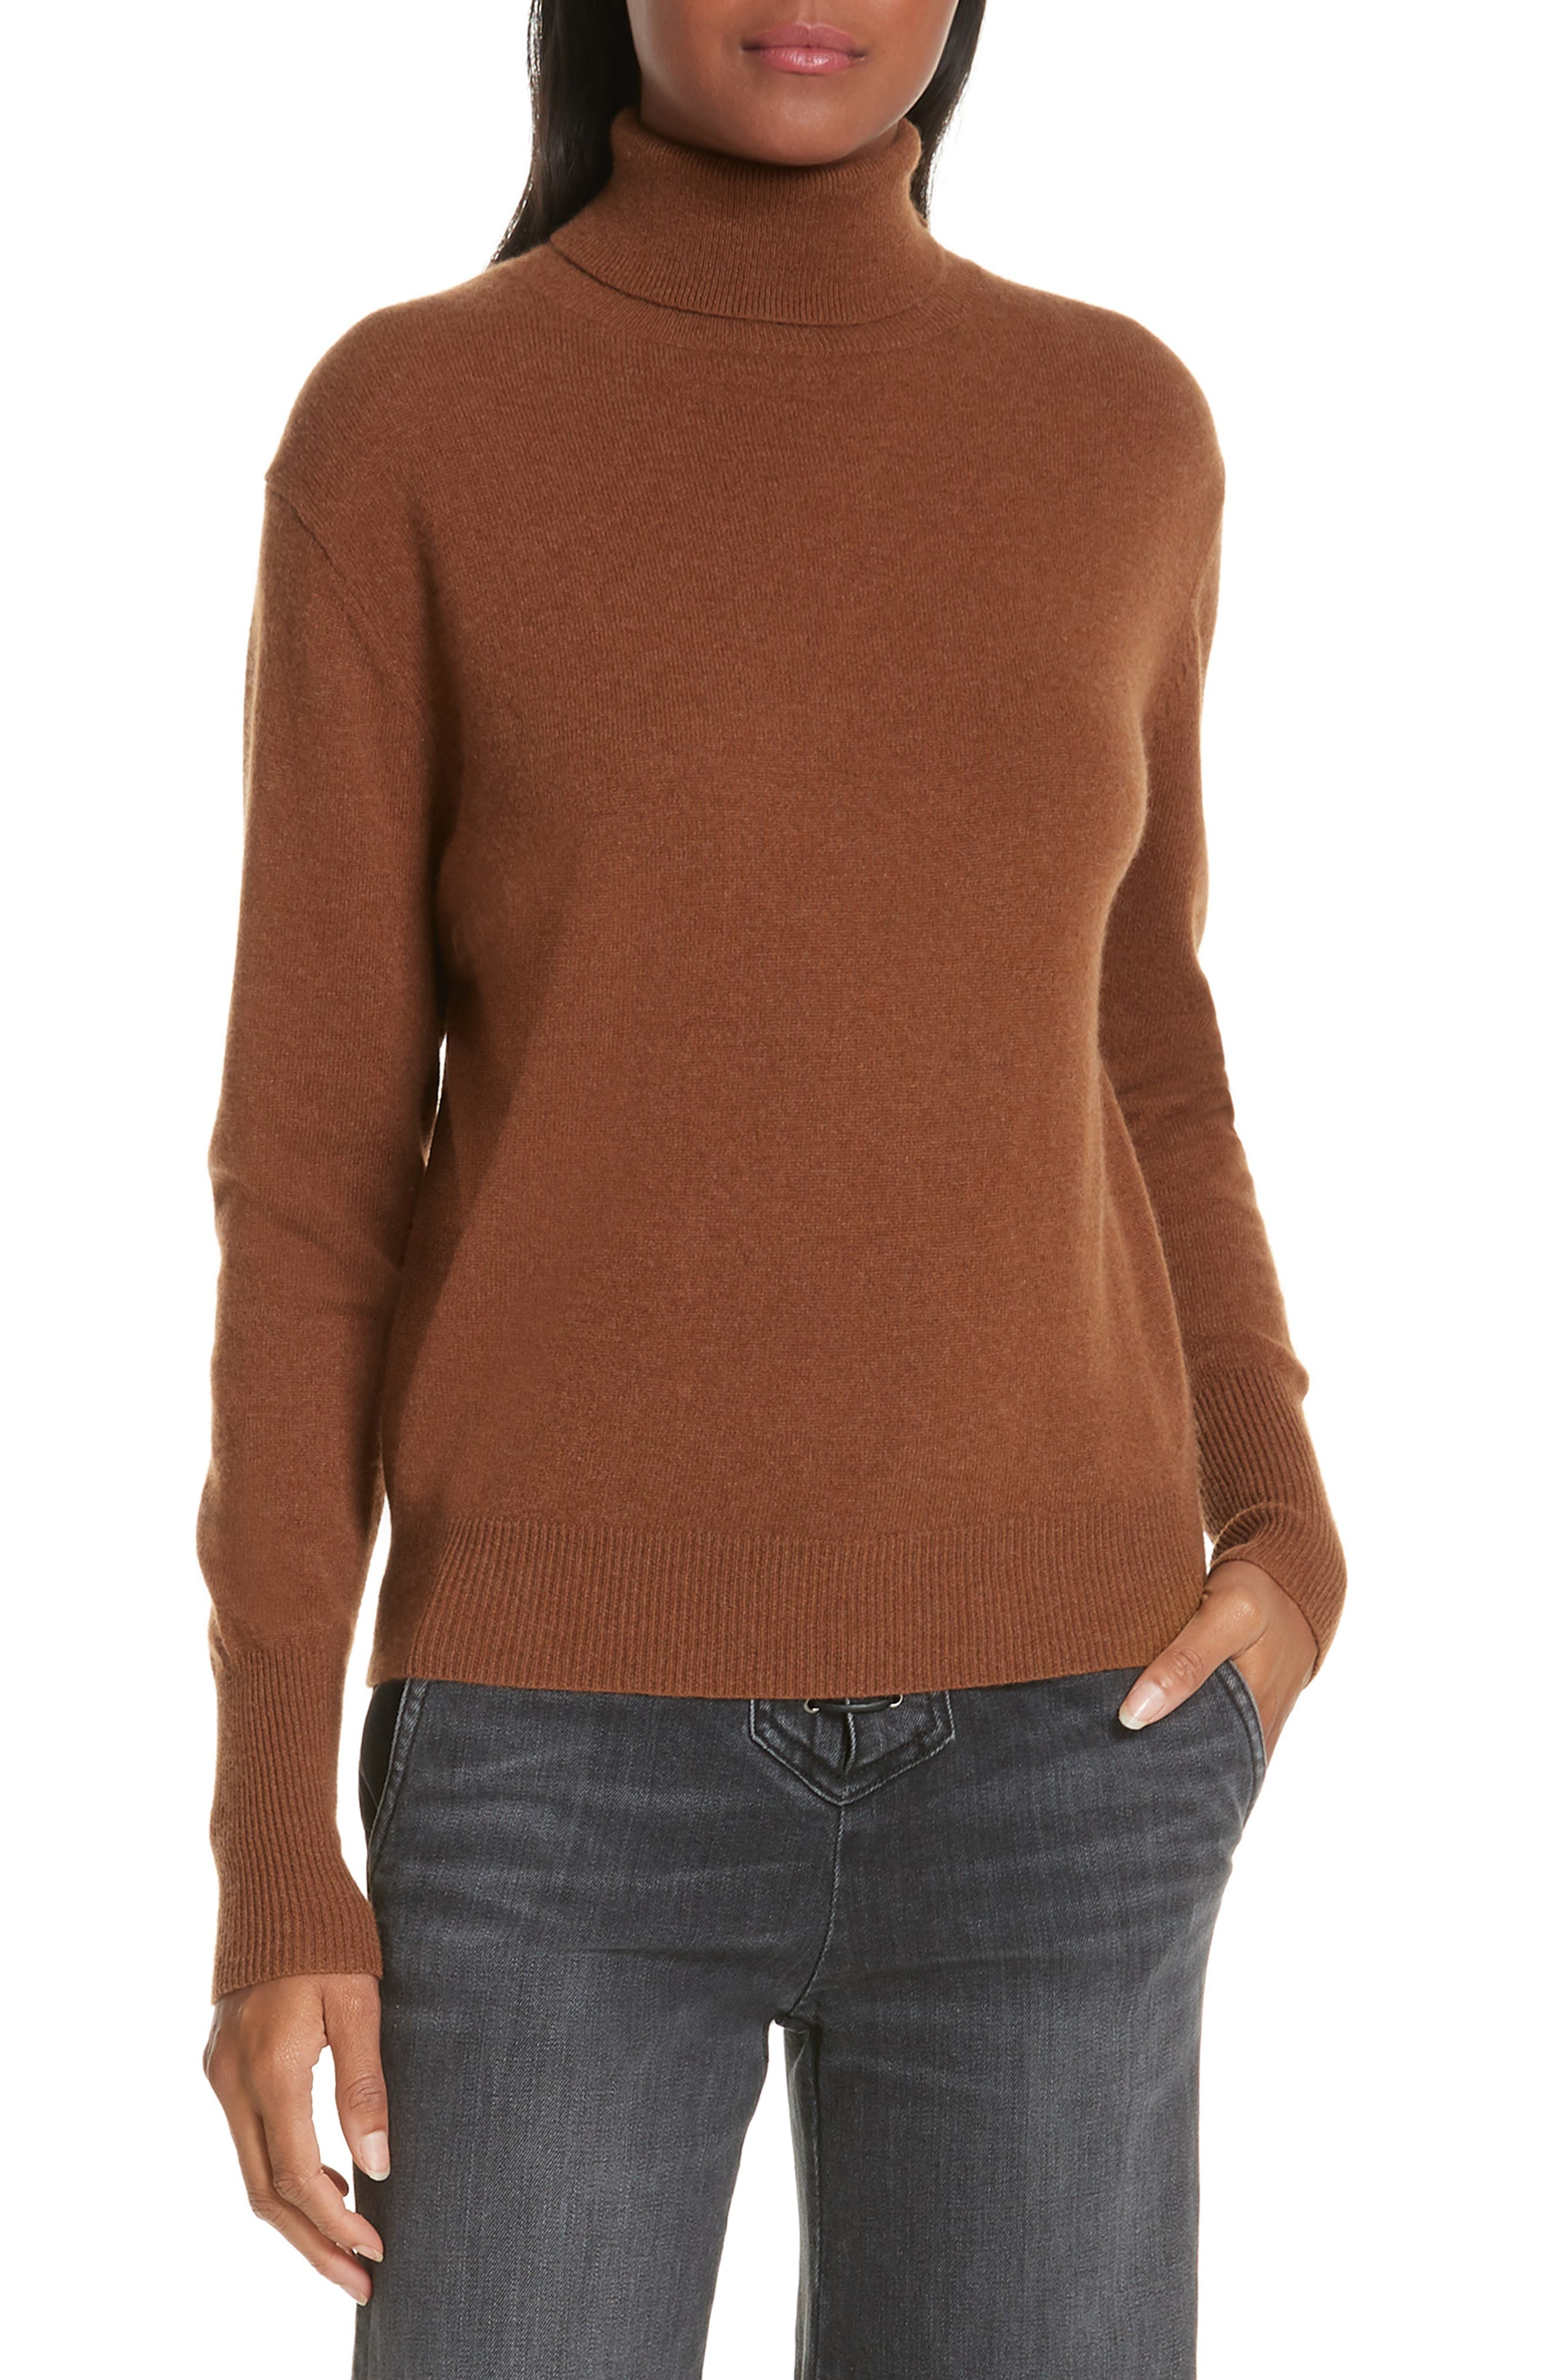 NILI LOTAN, Ralphie Cashmere Turtleneck Sweater, Main thumbnail 1, color, COGNAC